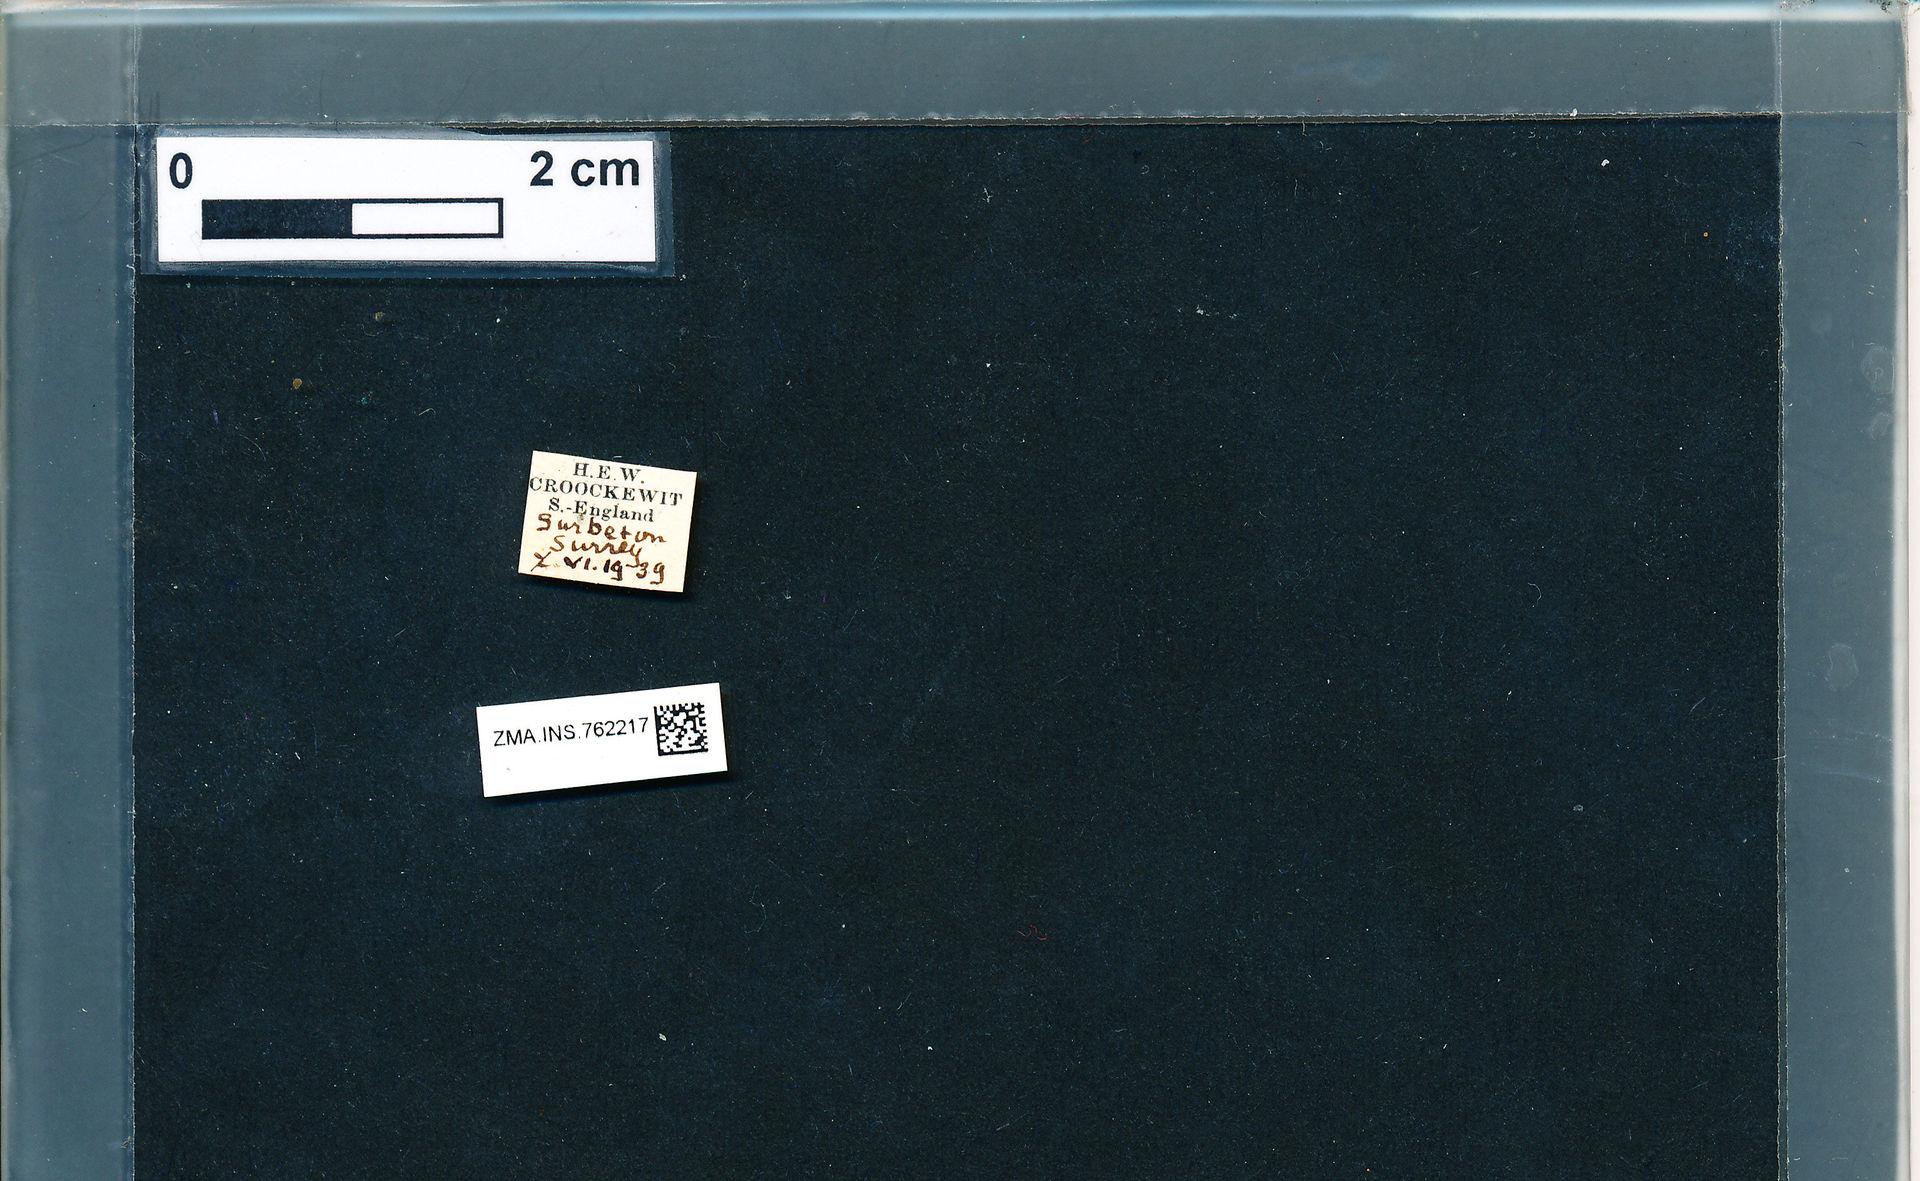 ZMA.INS.762217 | Bombus (Pyrobombus) pratorum pratorum Linnaeus, 1761